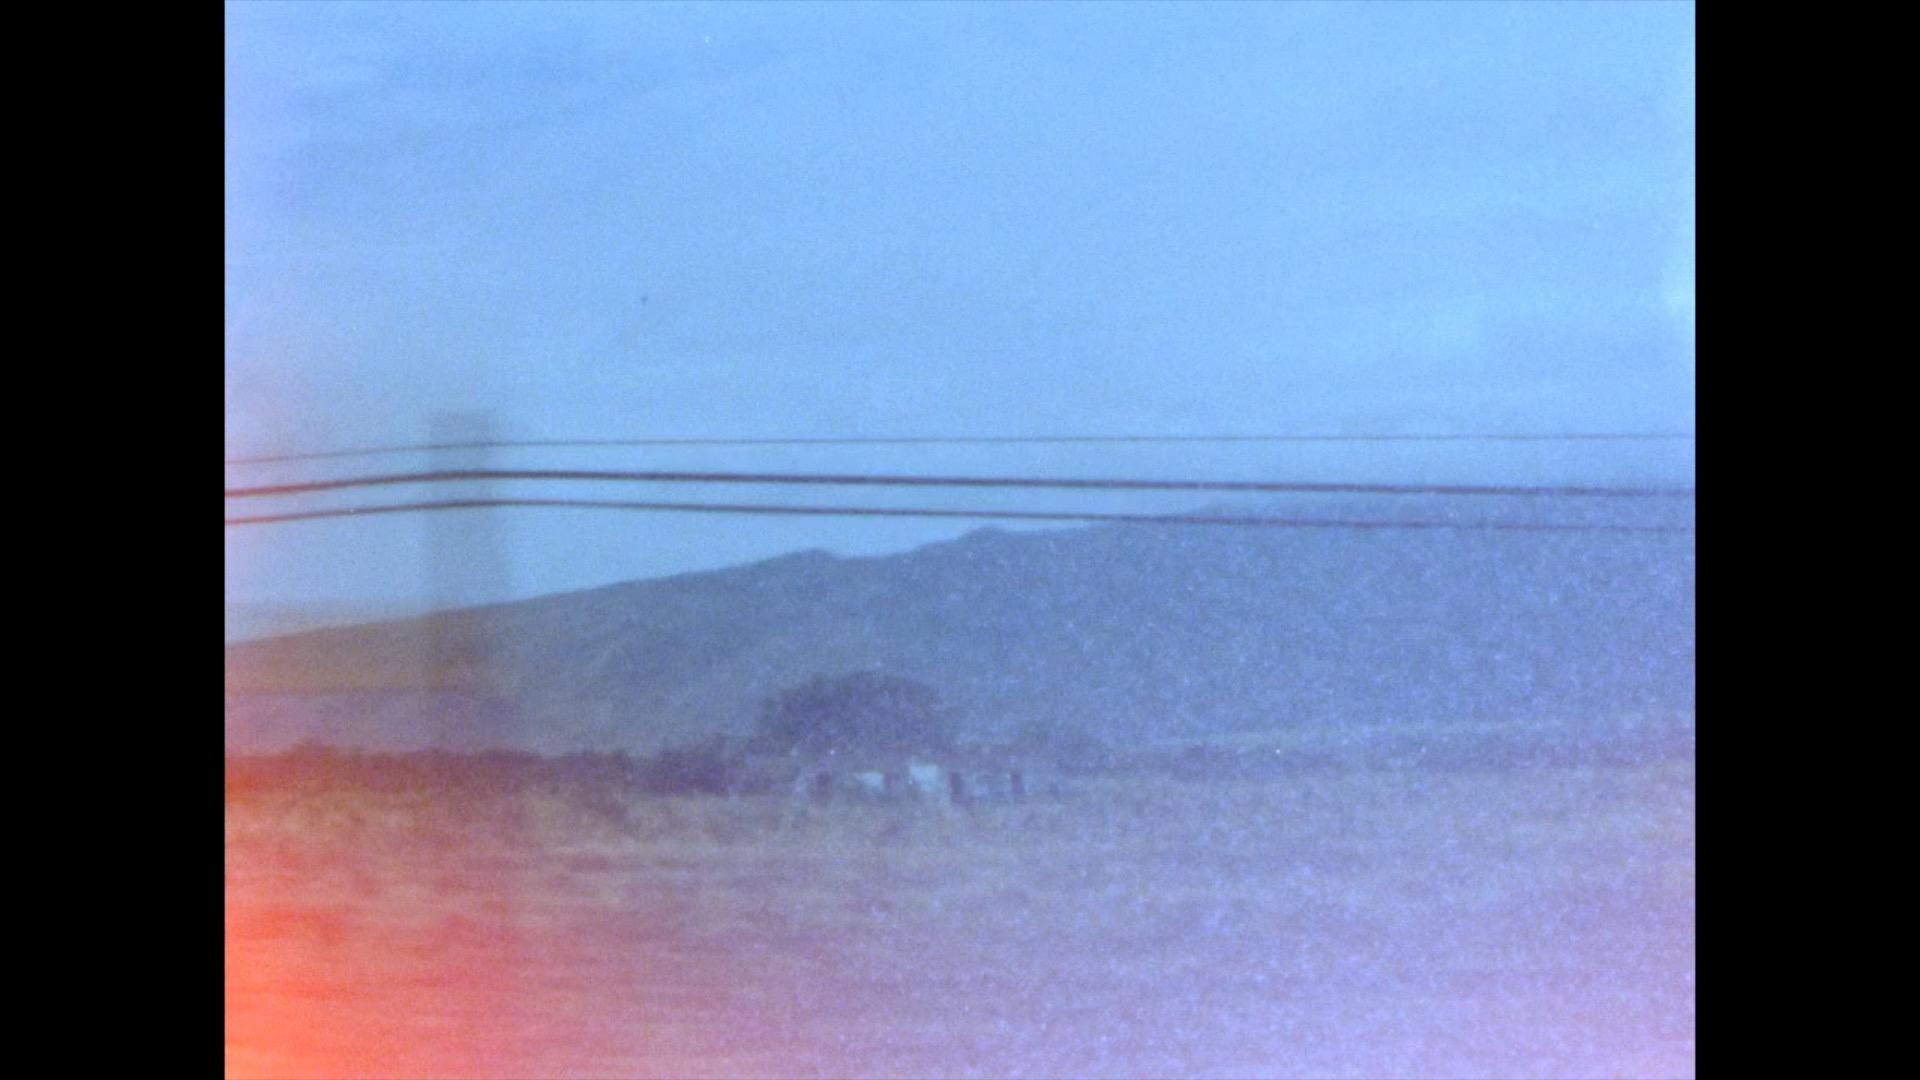 SUPER_8_FILMS1008.JPG